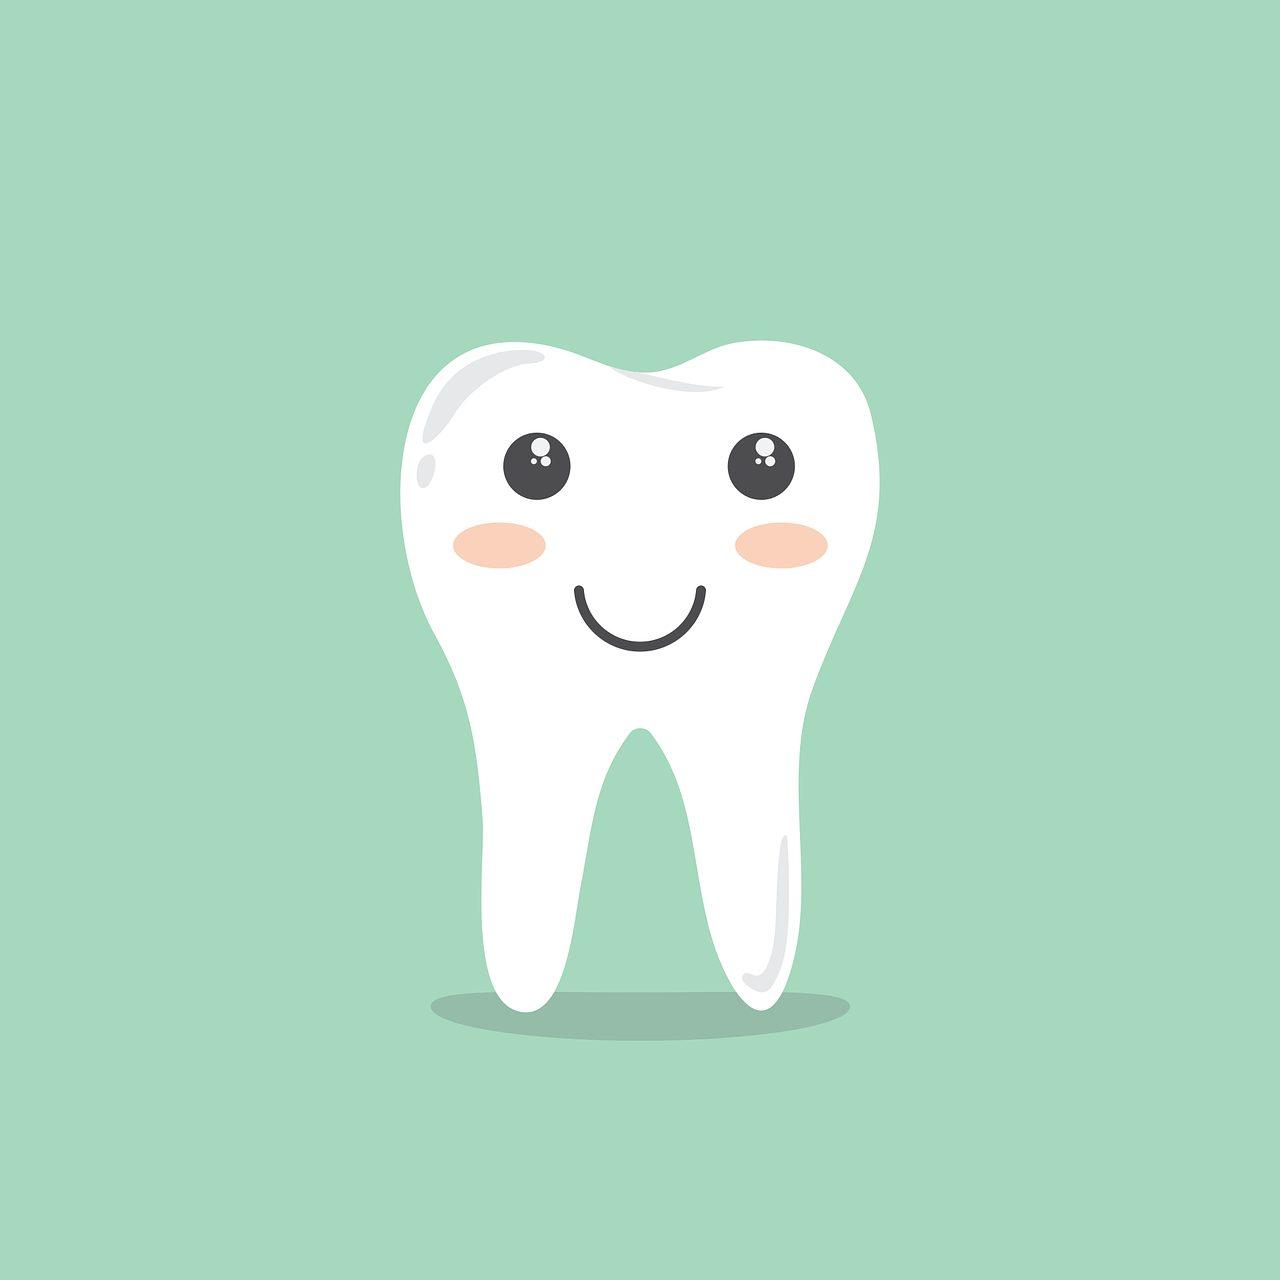 Tandheelkundig Centrum Bladel spoedhulp tandarts